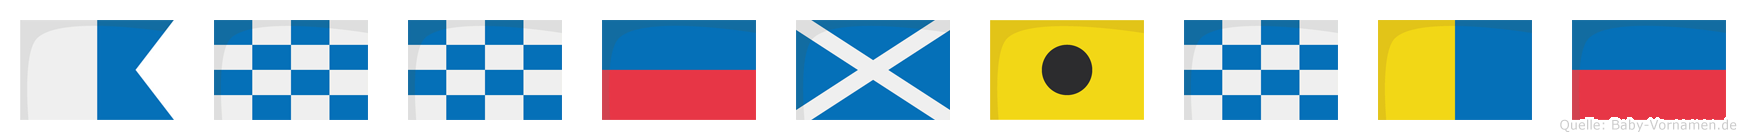 Anneminke im Flaggenalphabet